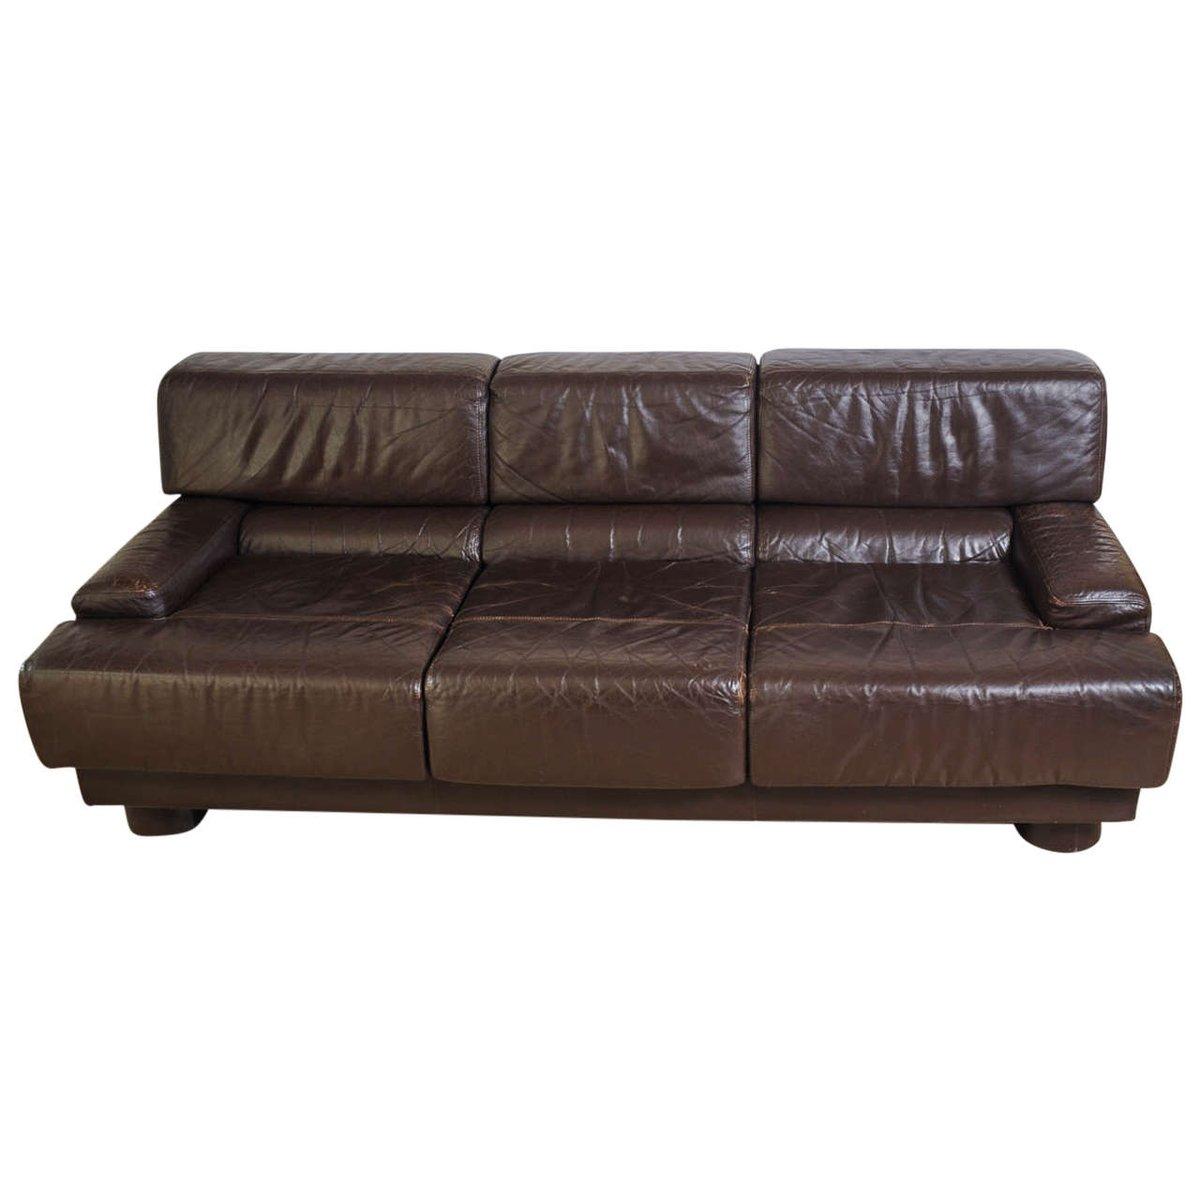 vintage sofa von percival lafer bei pamono kaufen. Black Bedroom Furniture Sets. Home Design Ideas